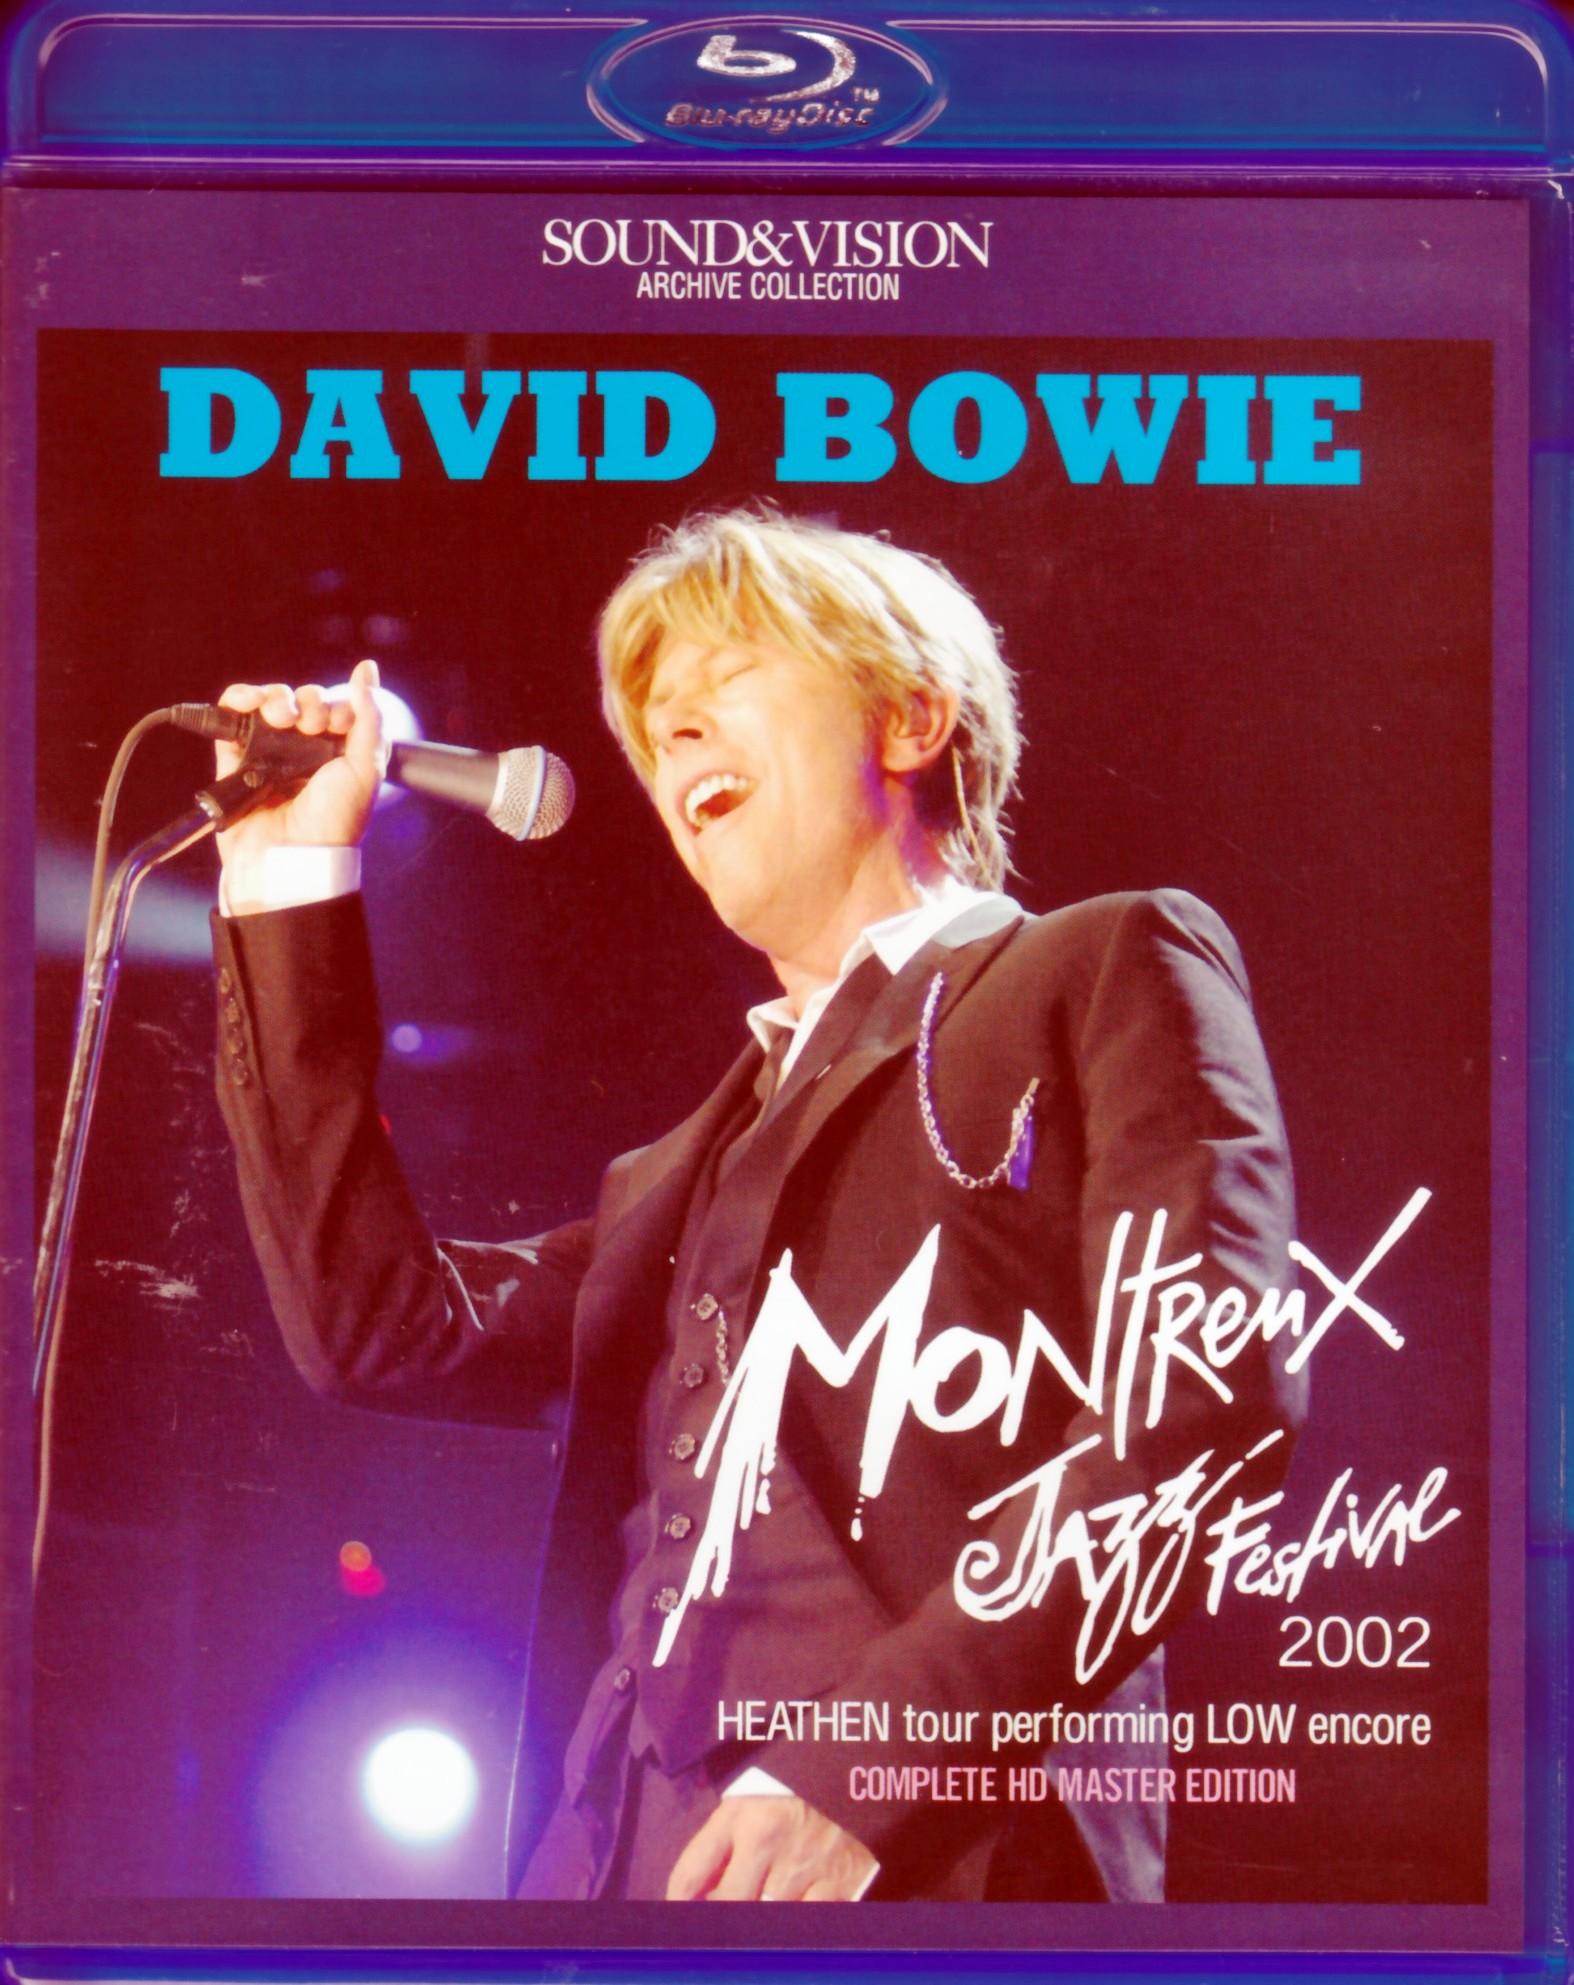 David Bowie デヴィッド・ボウイ/Switerland 2002 Blu-Ray Version